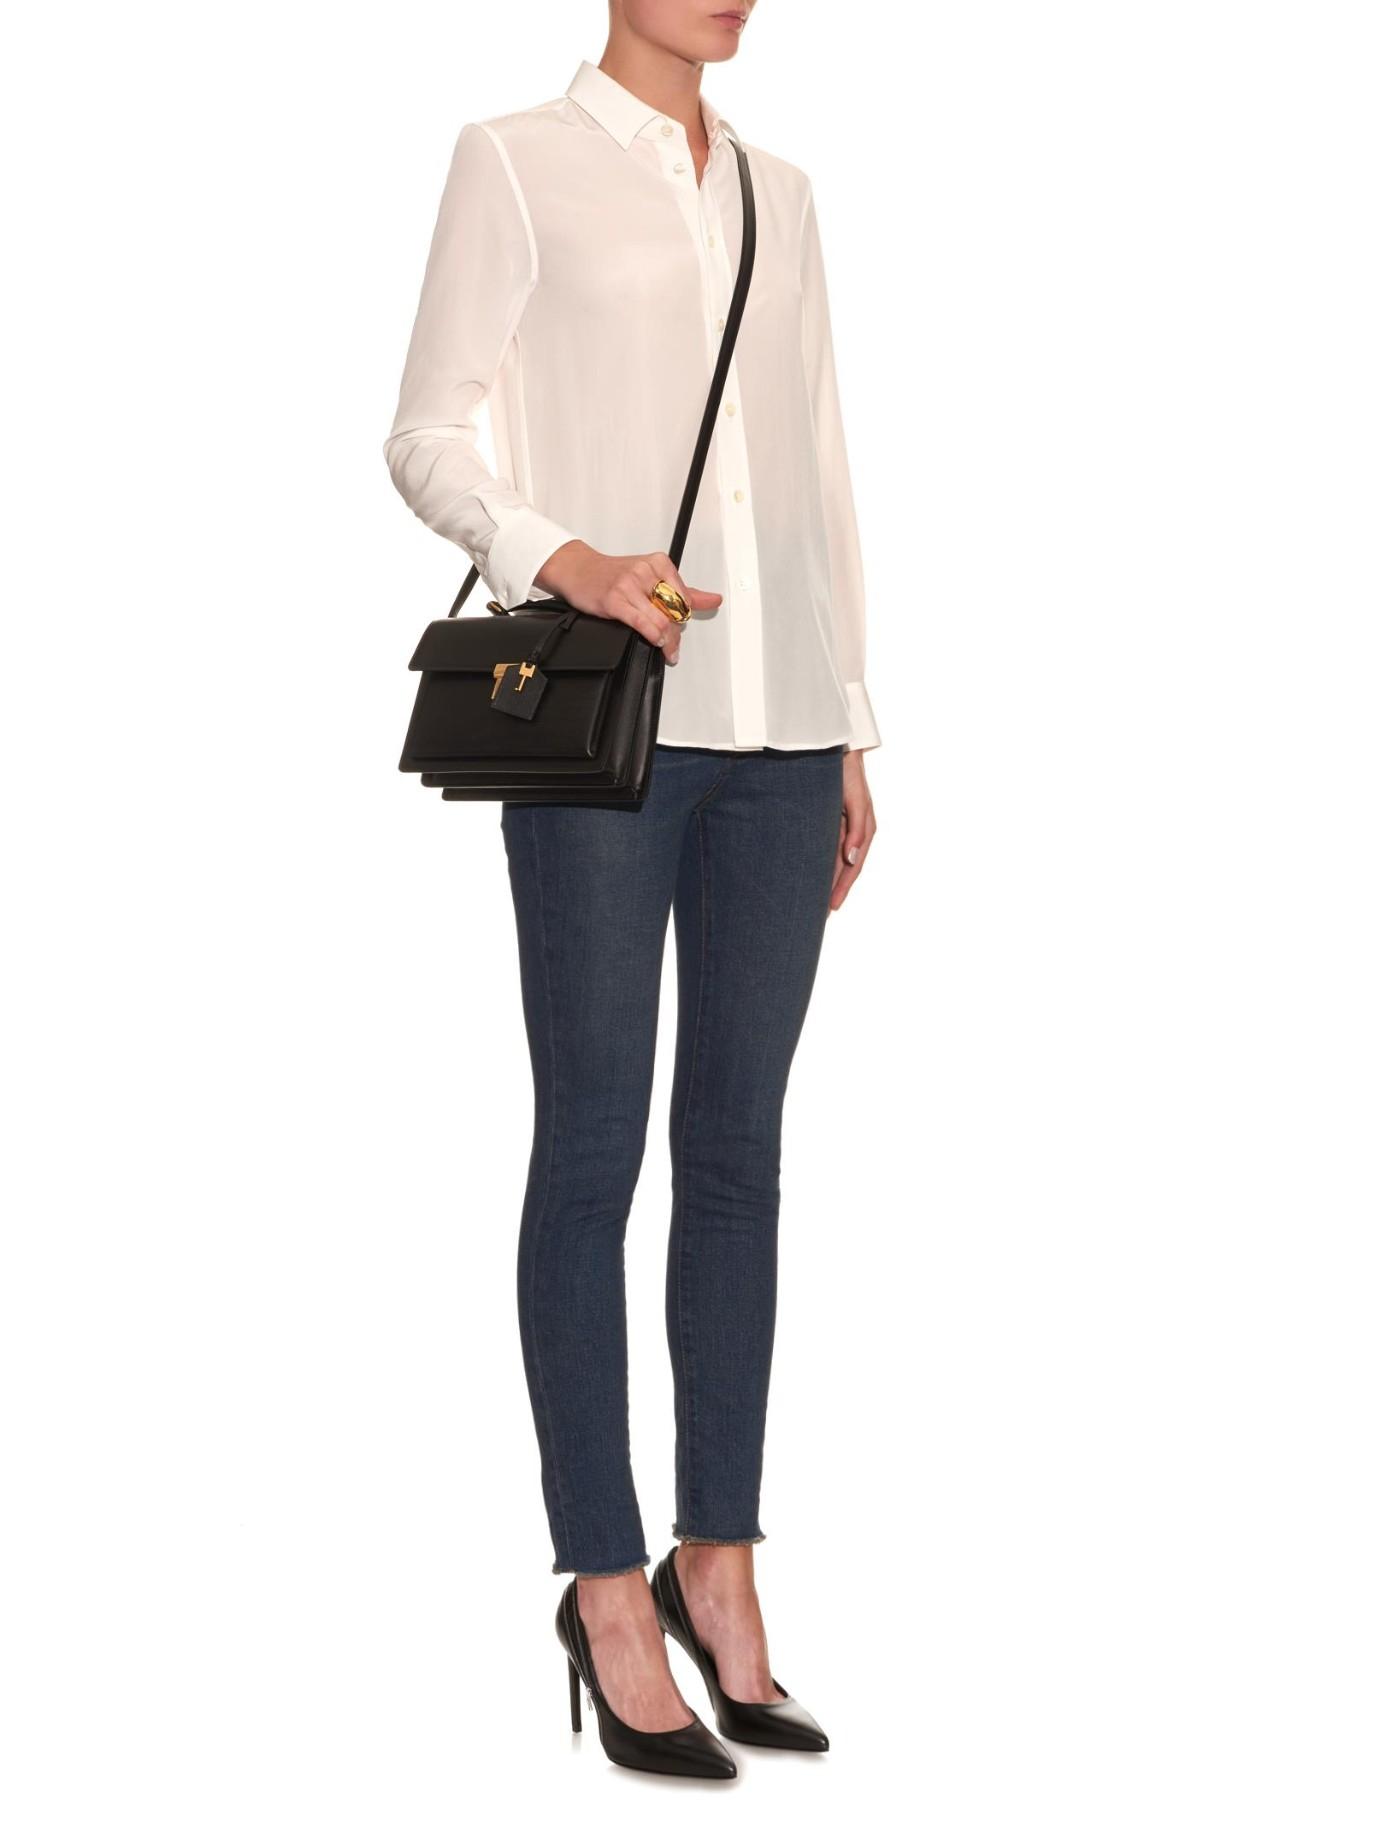 951b6913f51e Lyst - Saint Laurent High School Medium Leather Shoulder Bag in Black